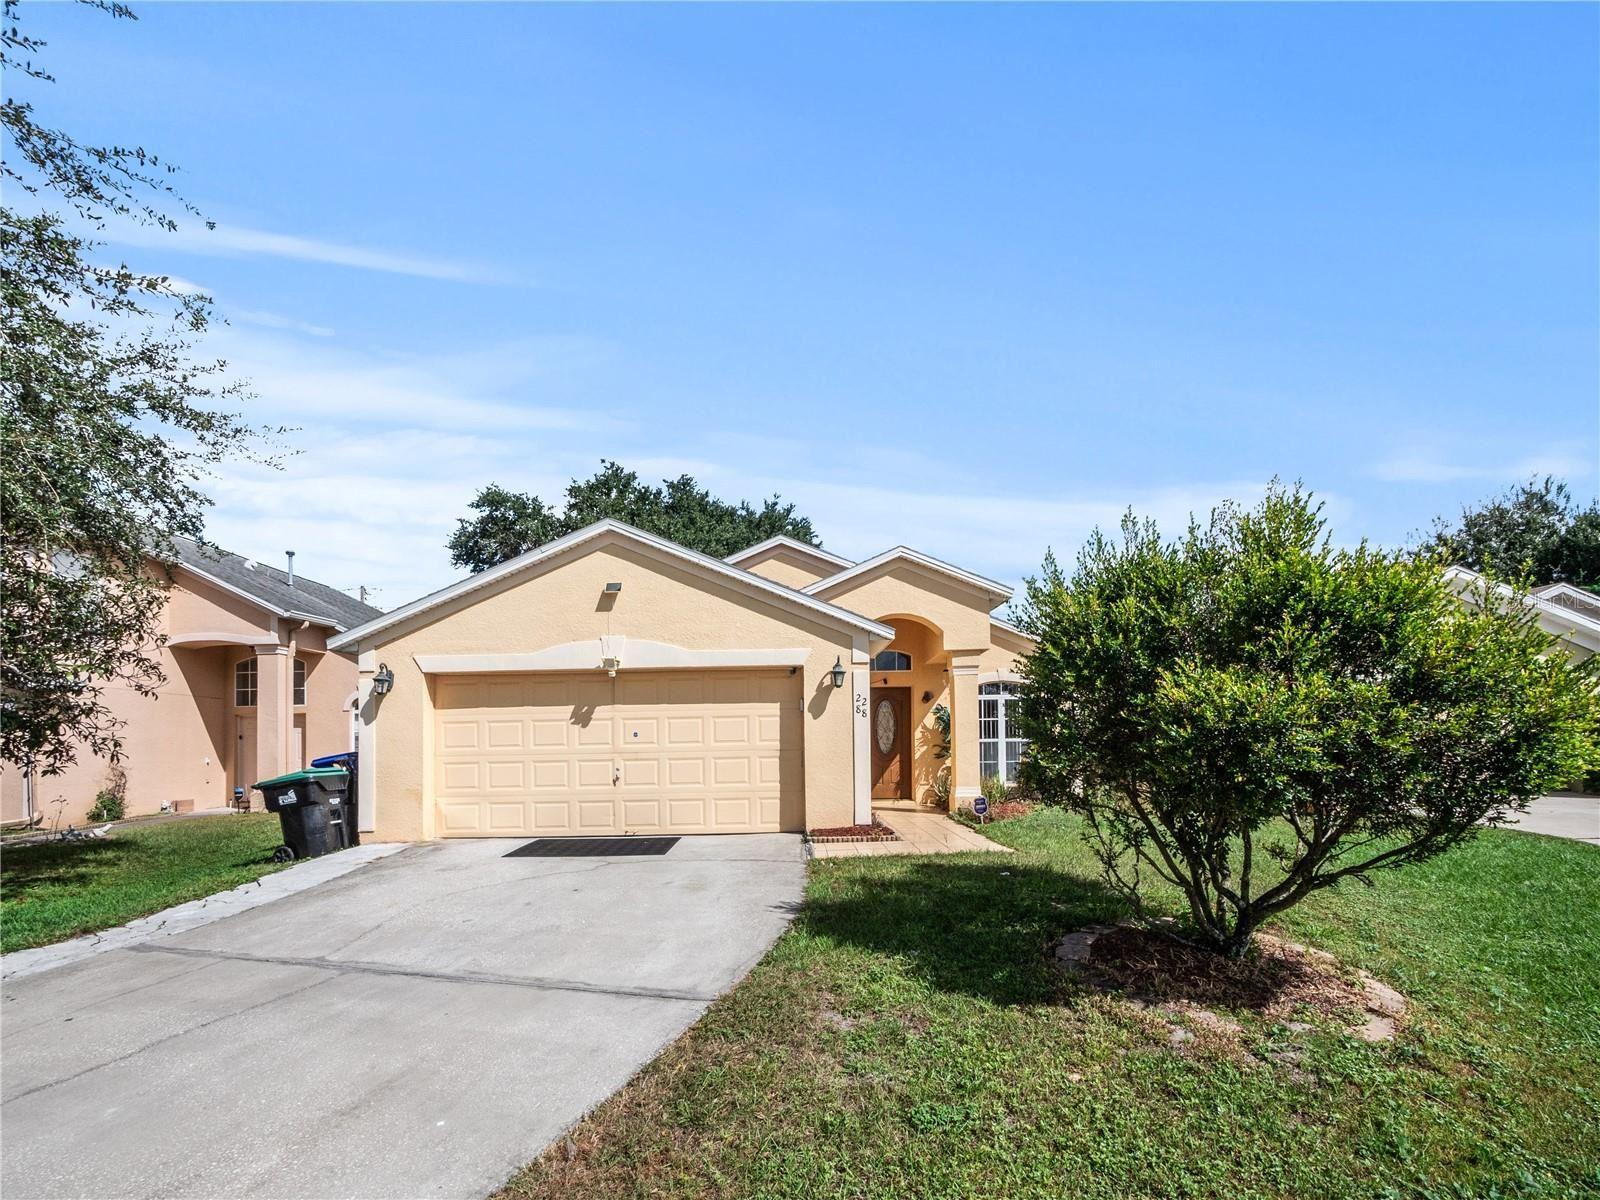 2288 BLUE SAPPHIRE CIRCLE, Orlando, FL 32837 - #: O5980137